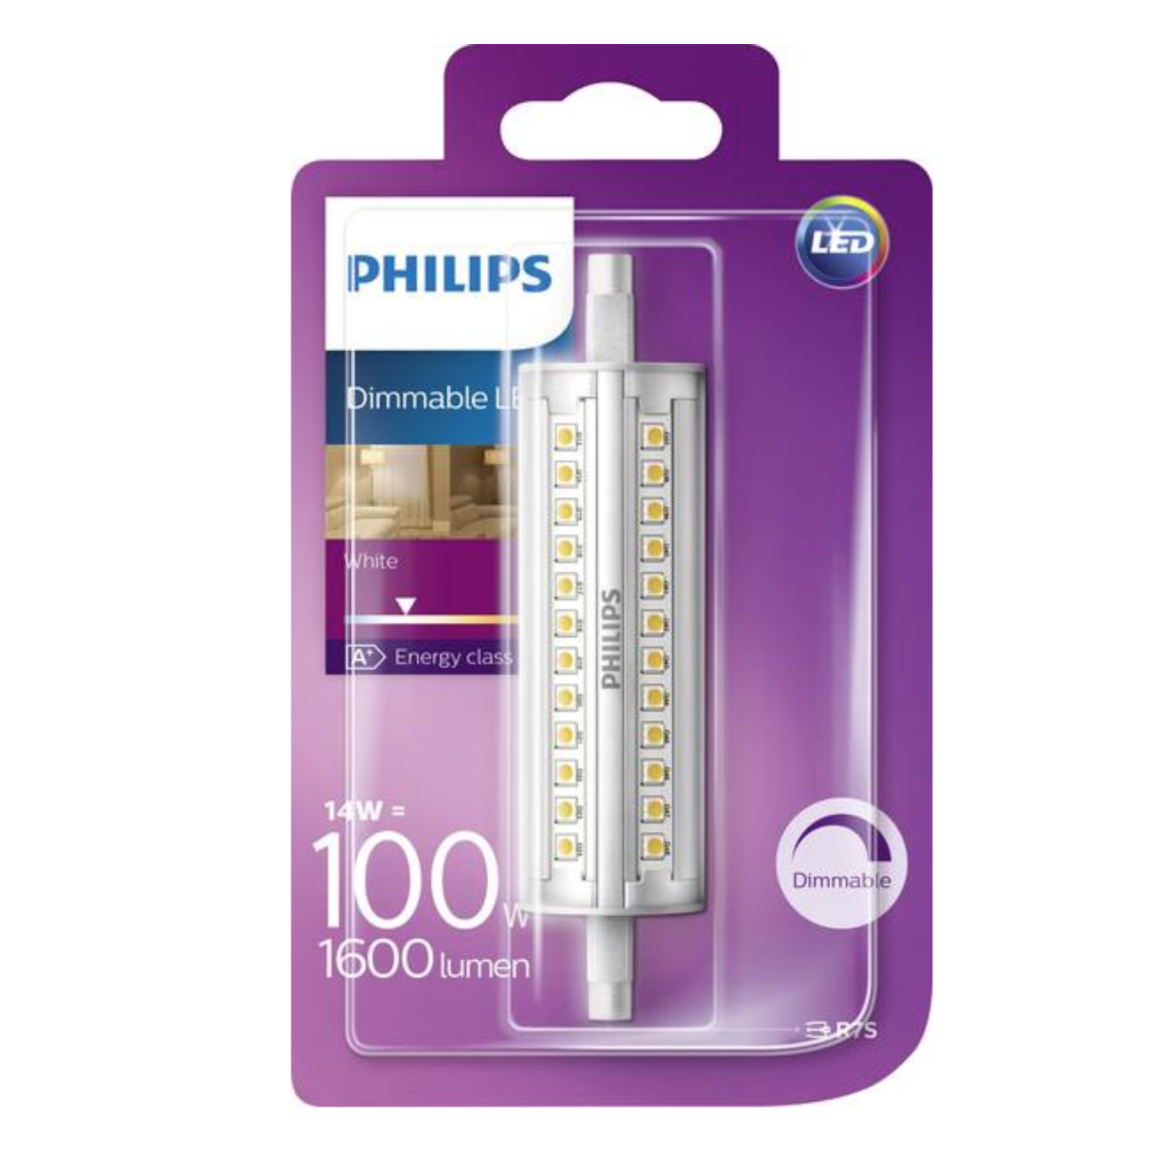 PHILIPS DIMMABLE LED WHITE 100 W 1600 LUMENS AMPOULE R7S R 7S LUMINAIRE MAISON  8718696578735 COMASOUND KARTEL CSK ONLINE